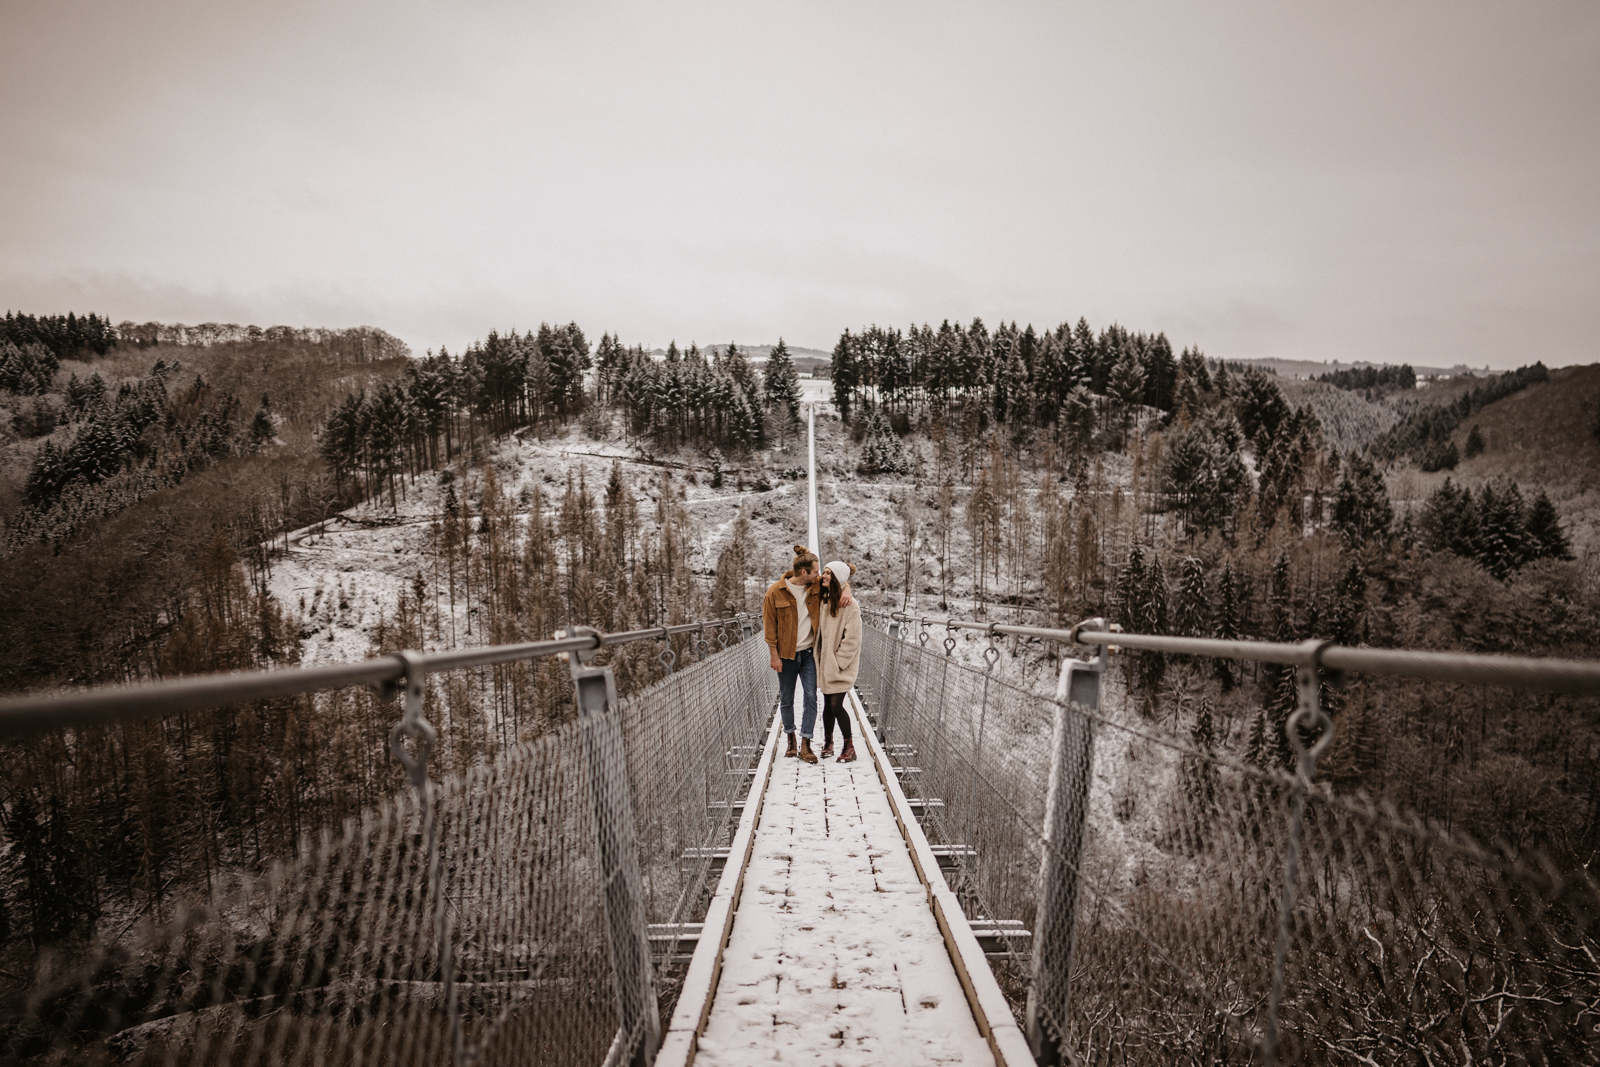 Winter Wonderland Above the Forest by Claudia Klassen